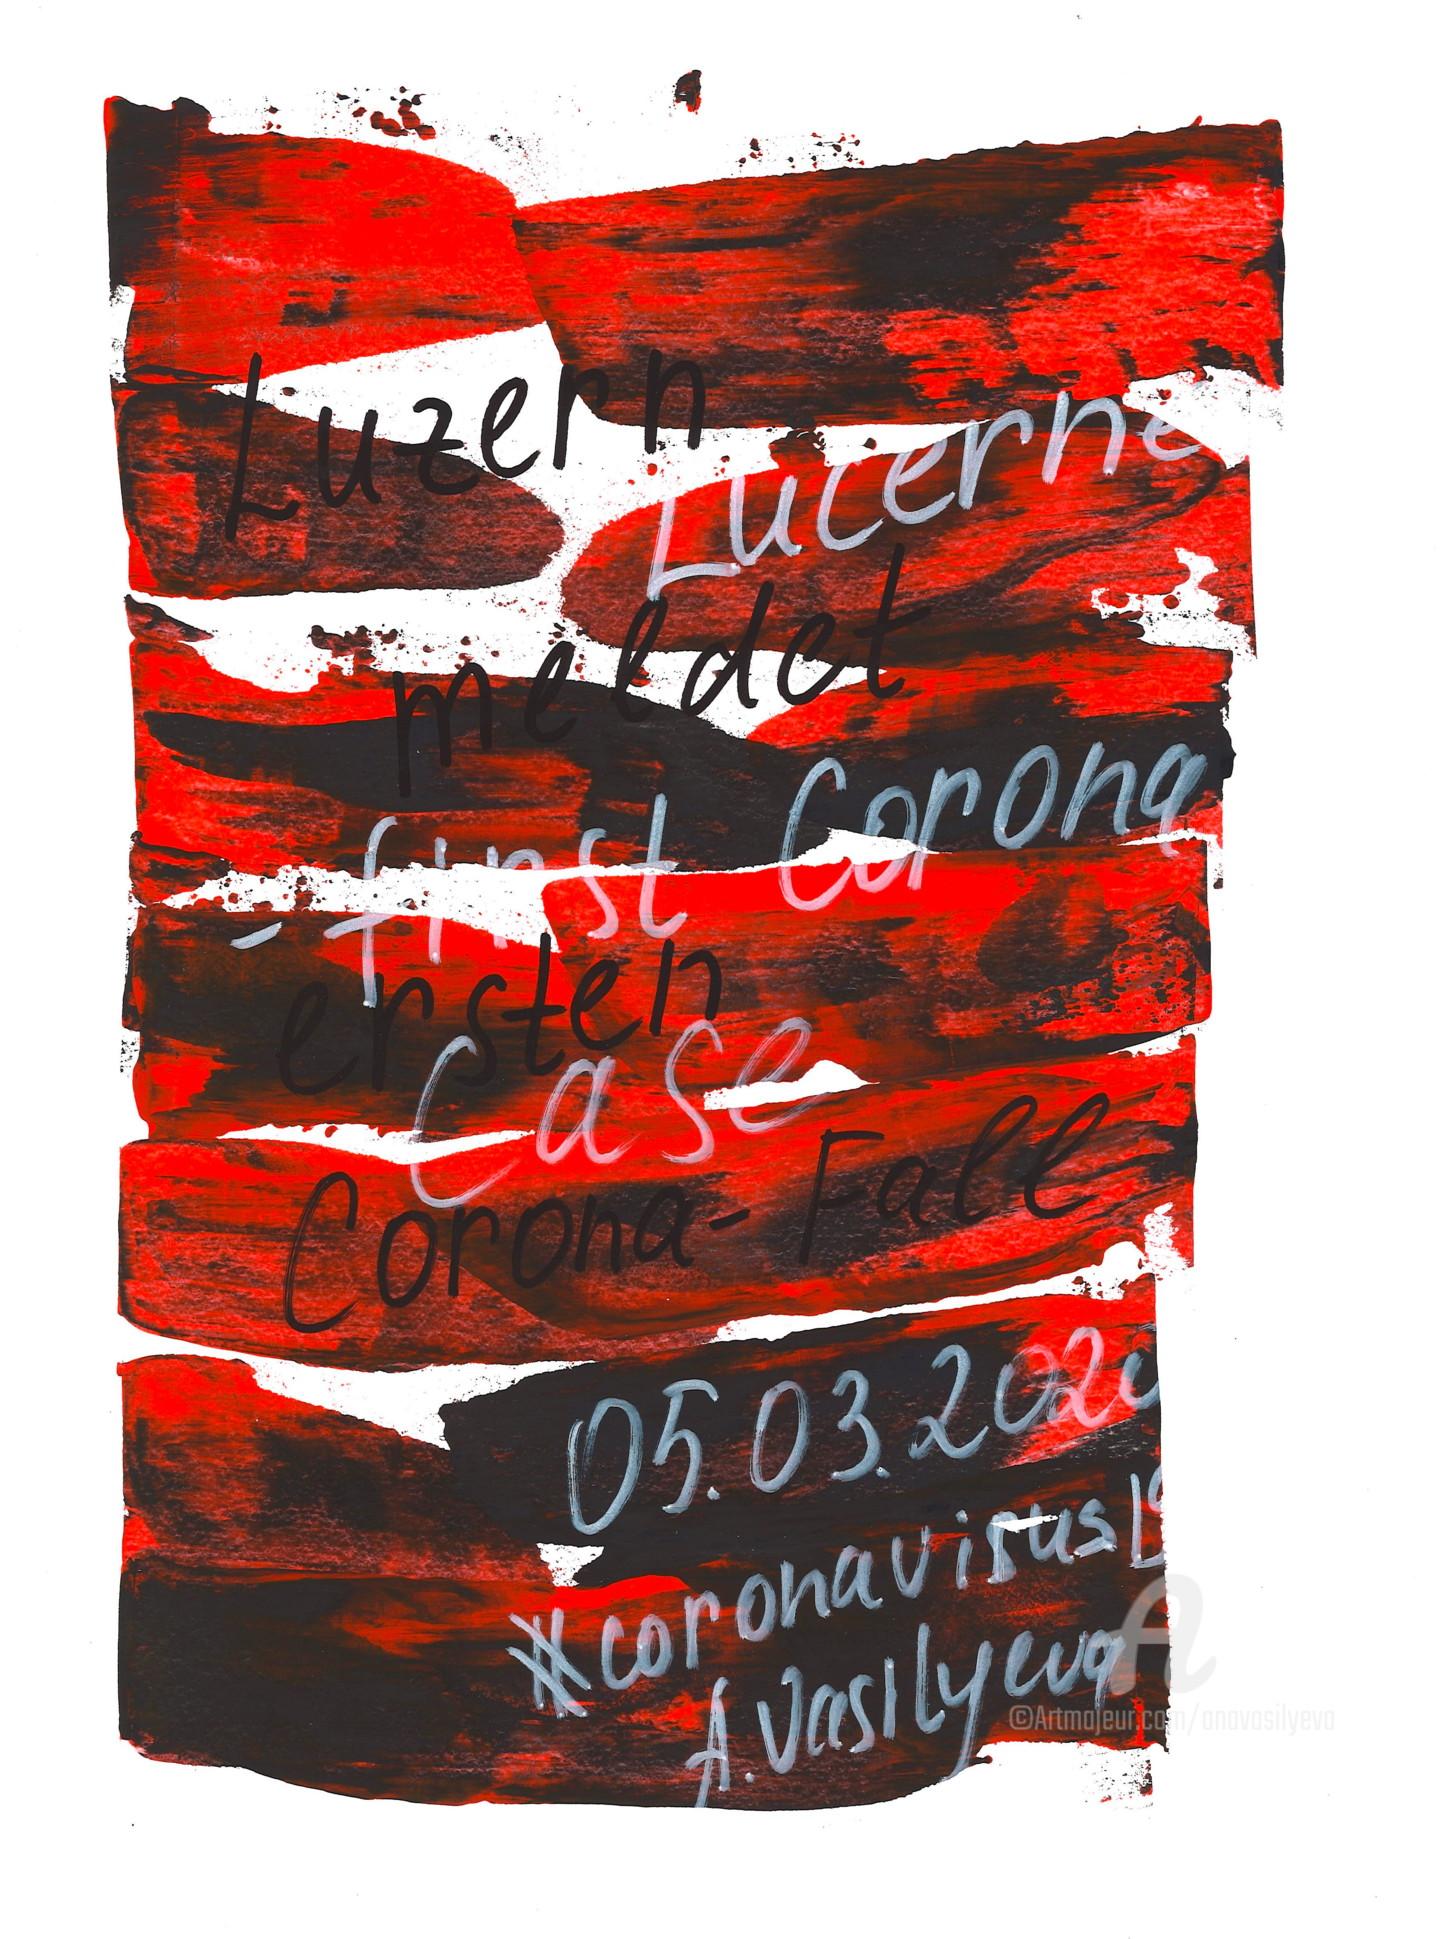 Anastasia Vasilyeva - 05.03.2020 - Lucerne has first Corona case. From COVID-19.